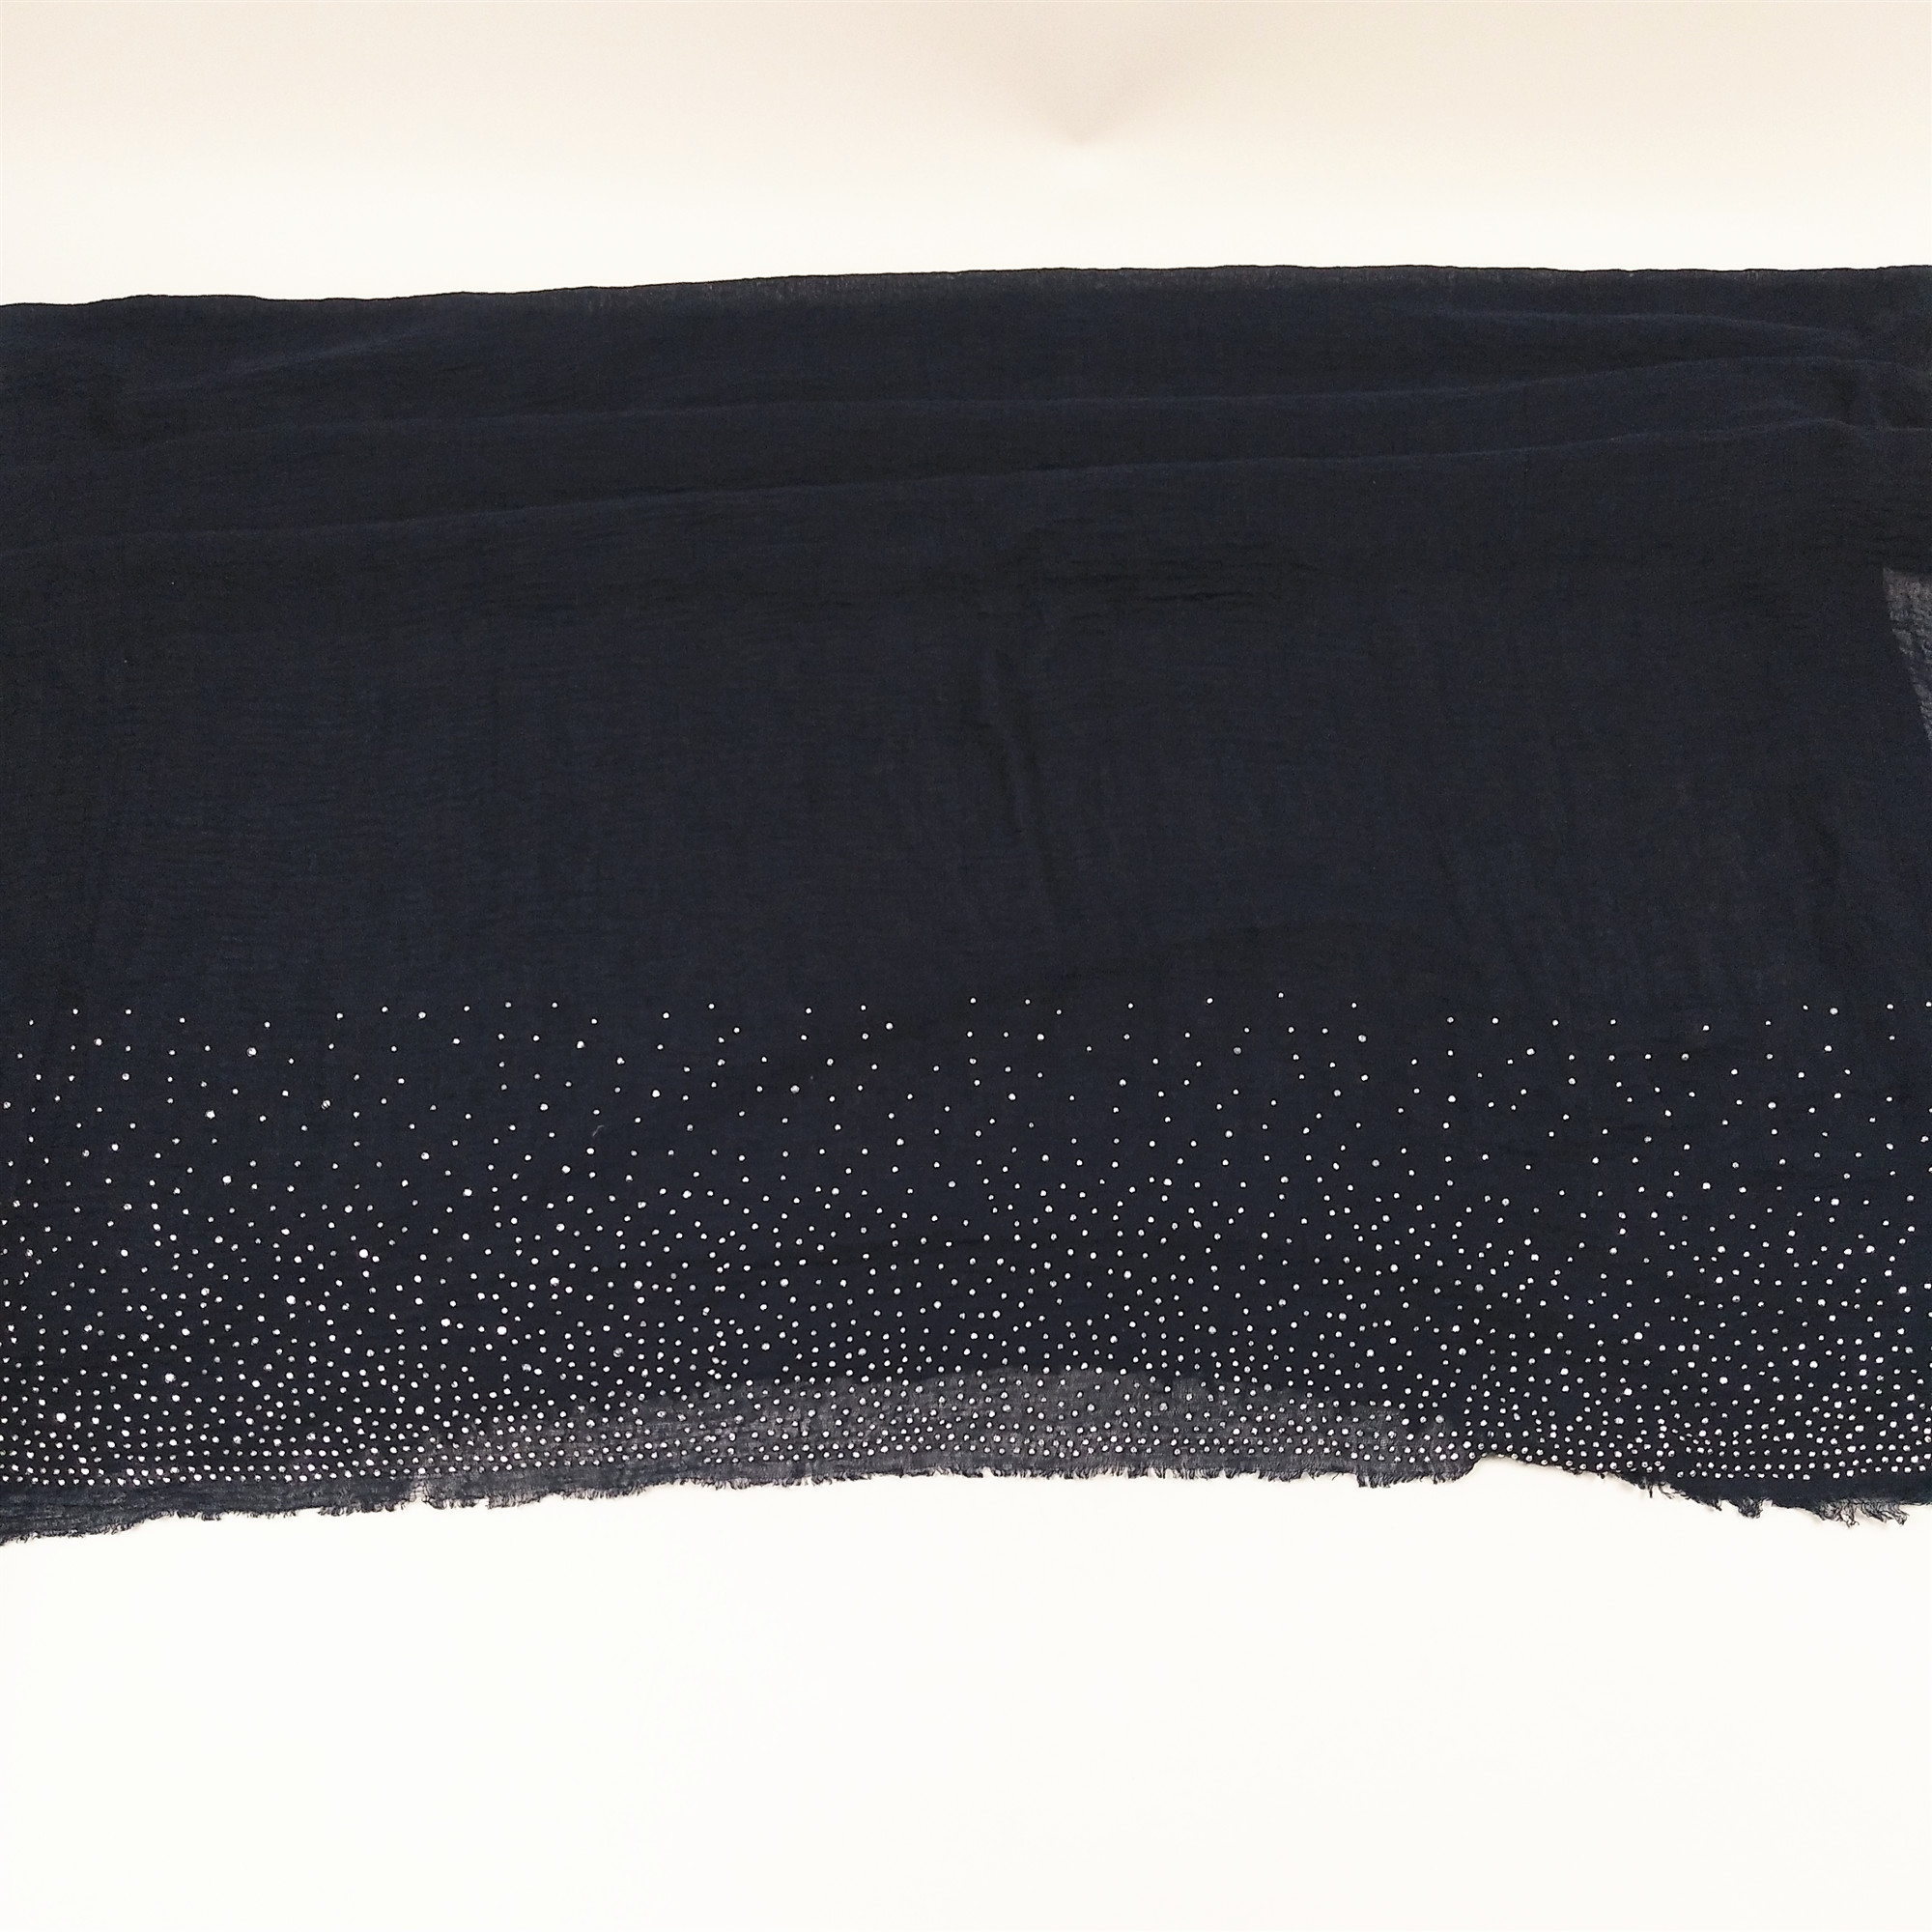 G23 High quality silver bead viscose crinkle cotton hijab bubble shawl diamond  scarf women wrap headband 180*90cm 10pcs/pcs